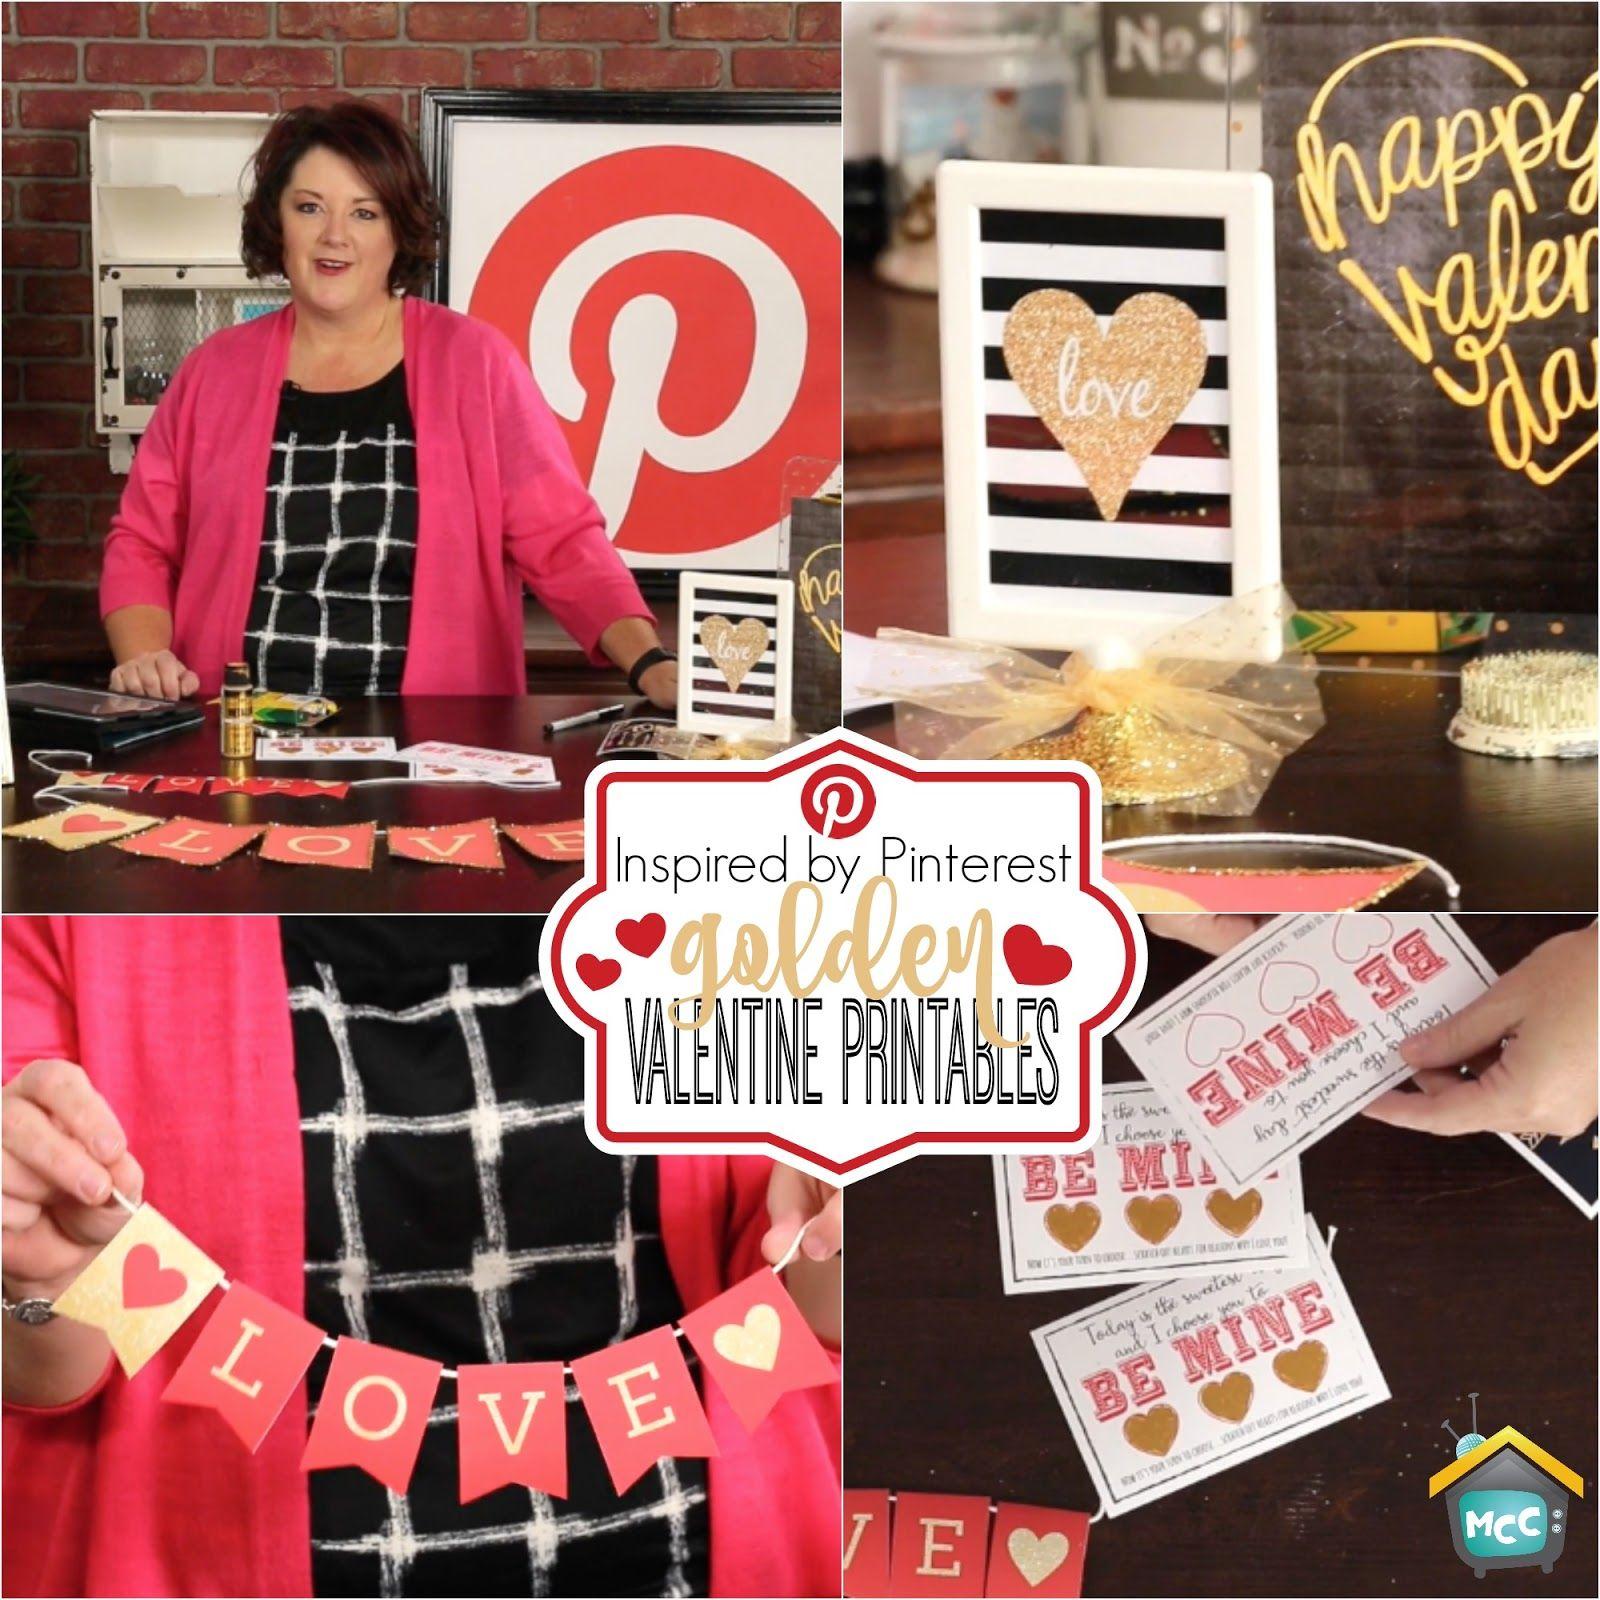 Allred Design Blog: Inspired by Pinterest: Golden Valentine Printables + Free Download